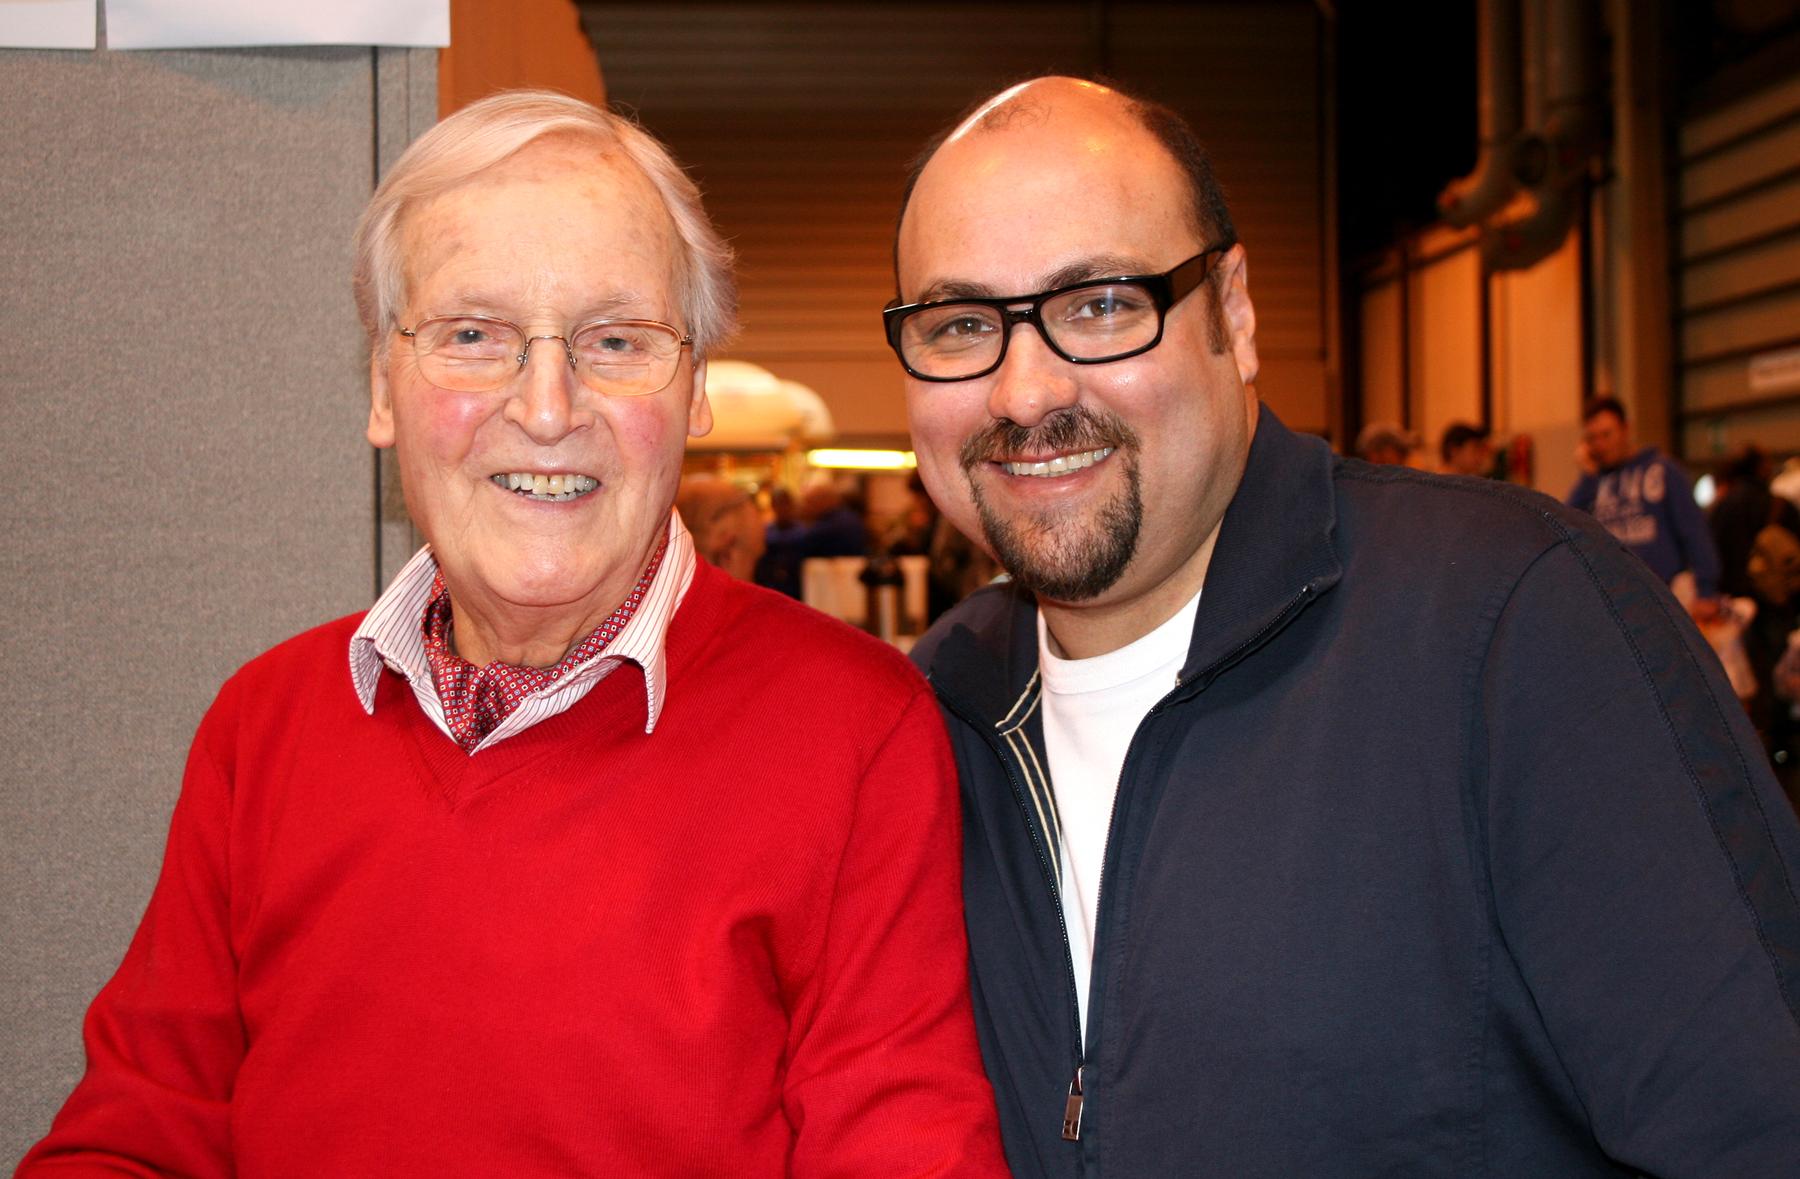 Nicholas Parsons & Dave Sherwood